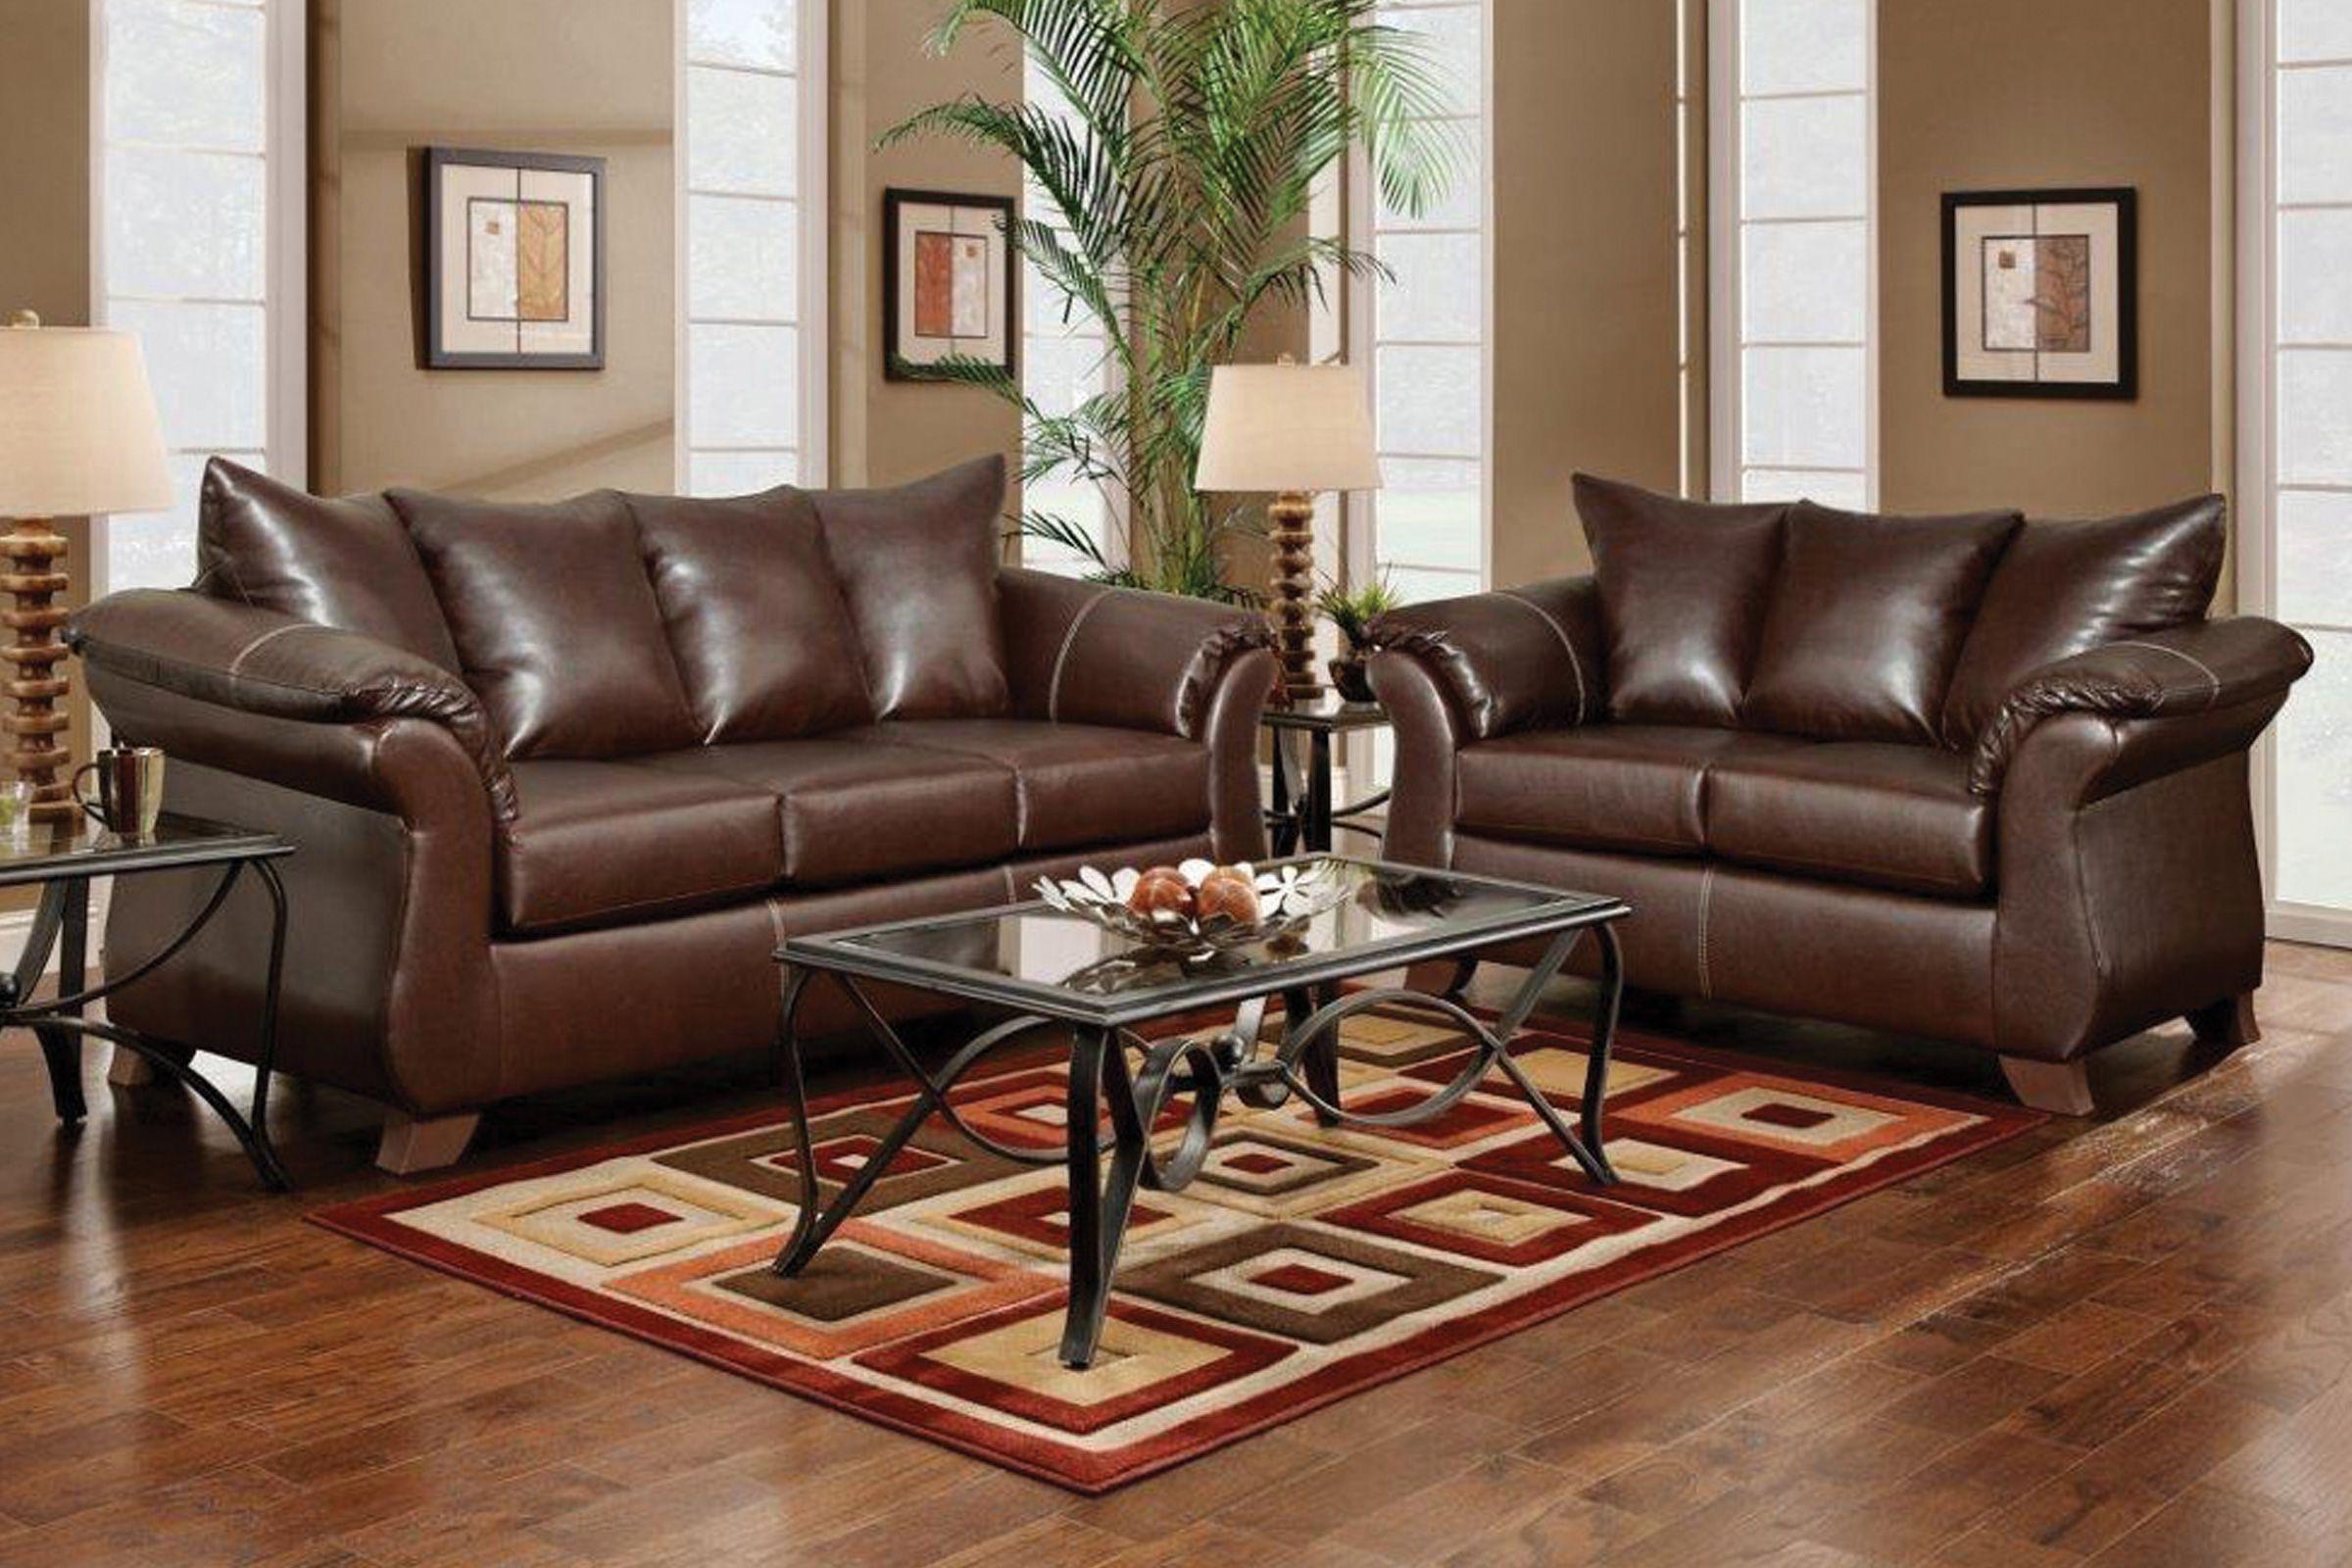 Bailey Leather Sofa & Loveseat